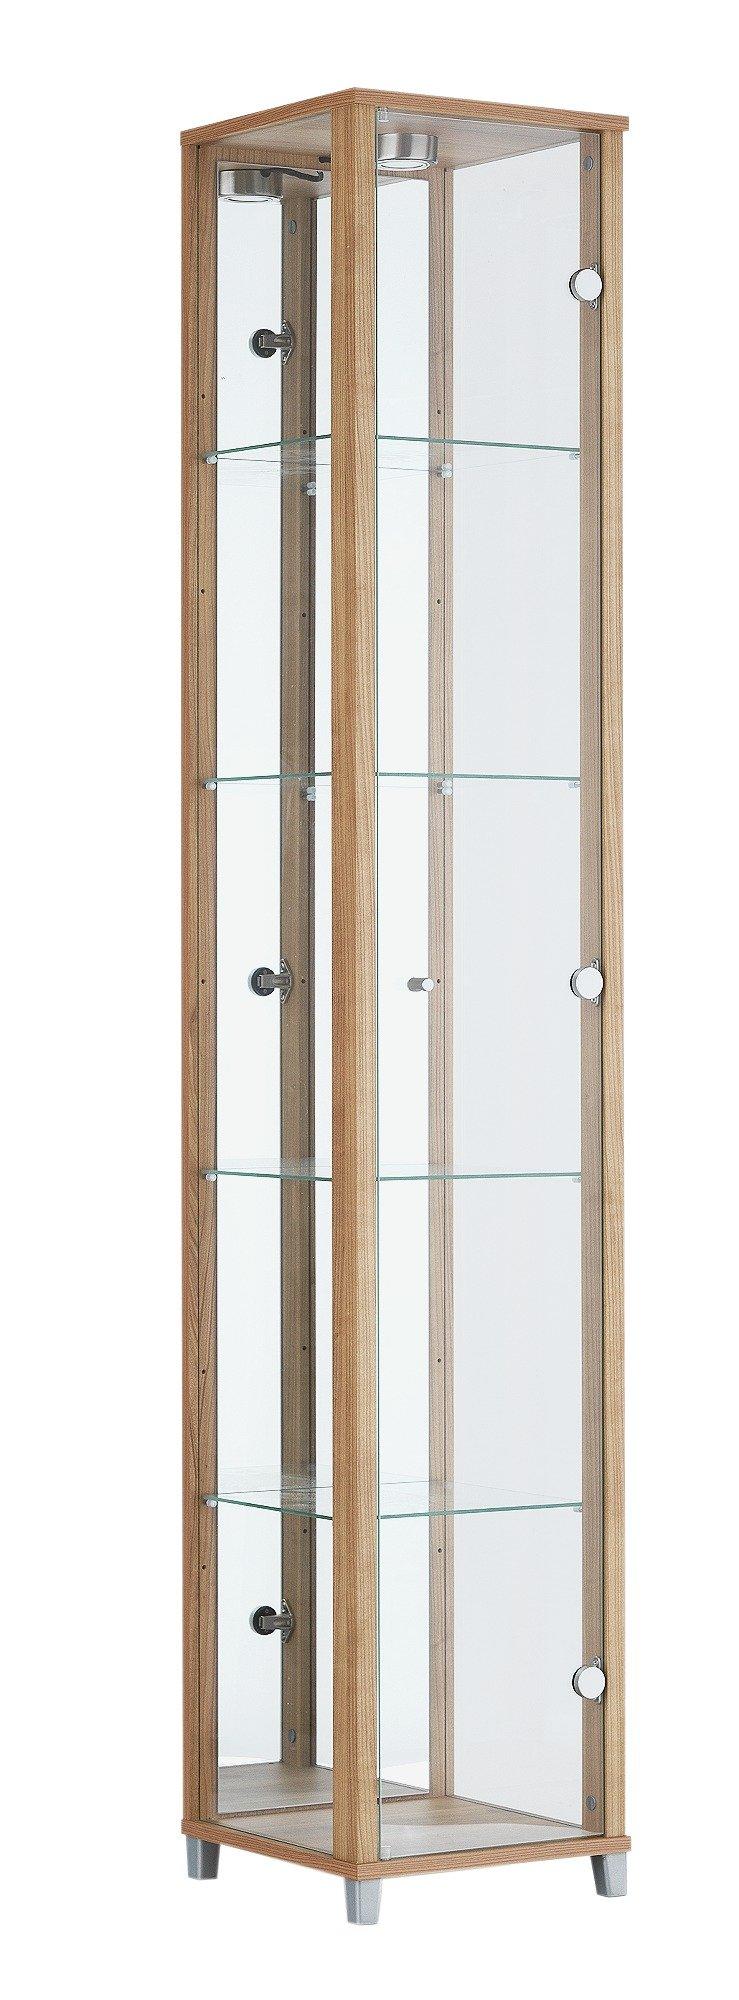 argos home 1 glass door display cabinet oak 5289390. Black Bedroom Furniture Sets. Home Design Ideas